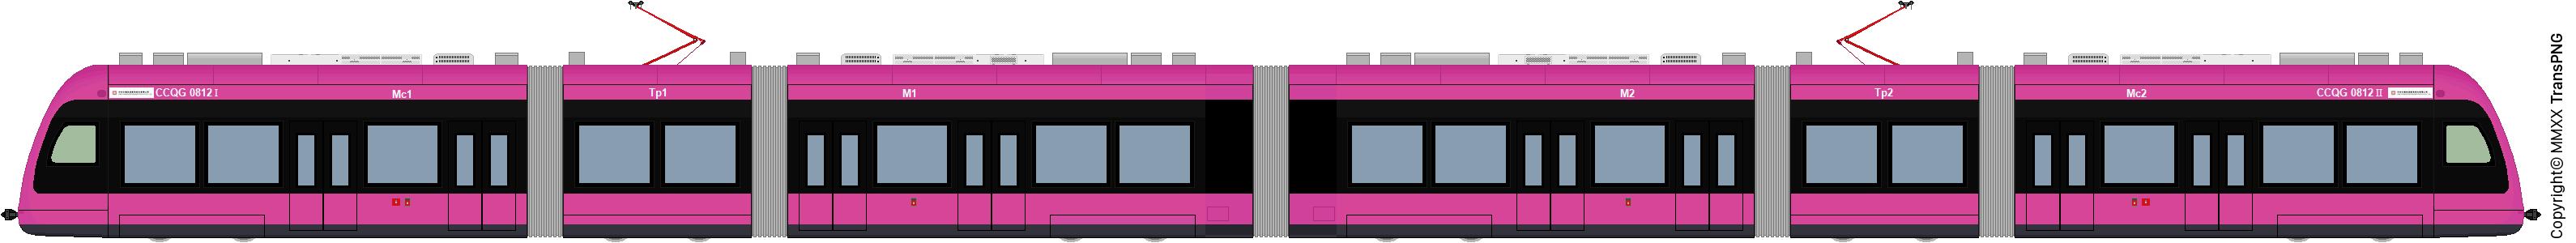 Train 5602